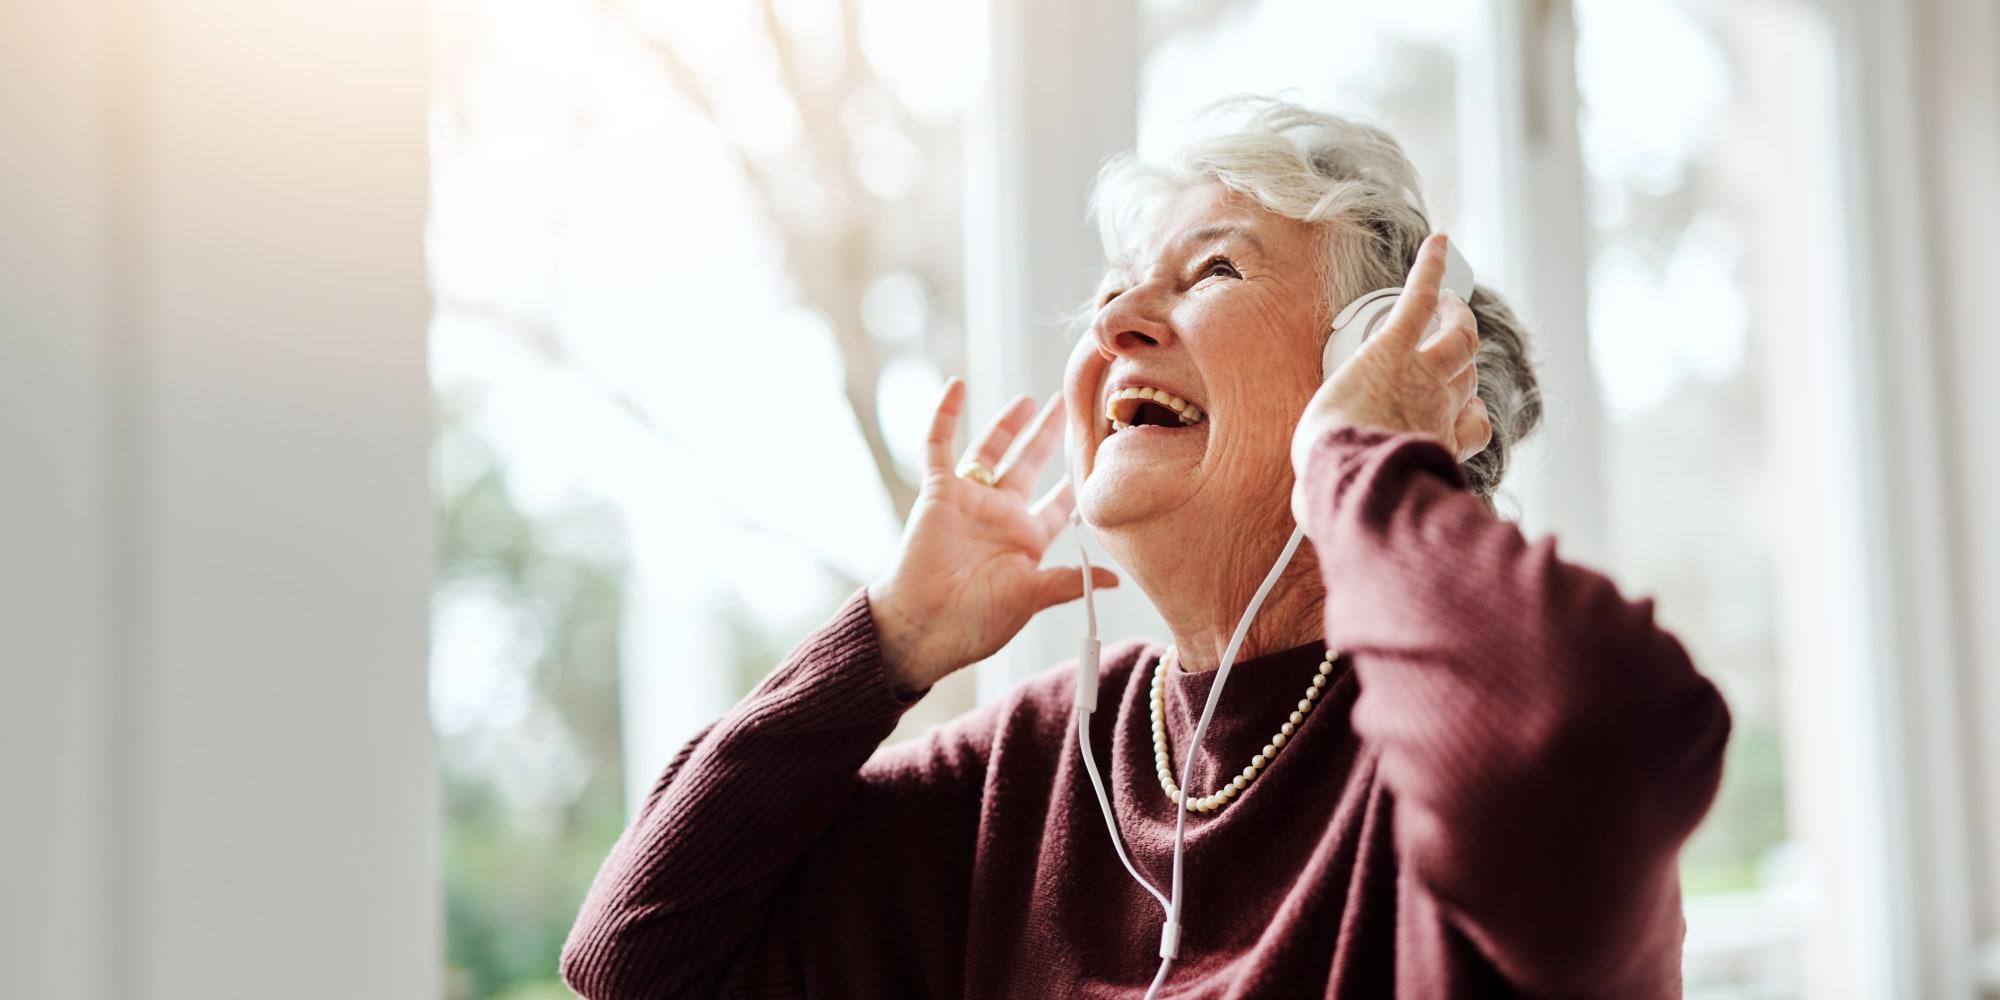 Milestone Senior Living in Cross Plains, Wisconsin offers a handful of senior living options.